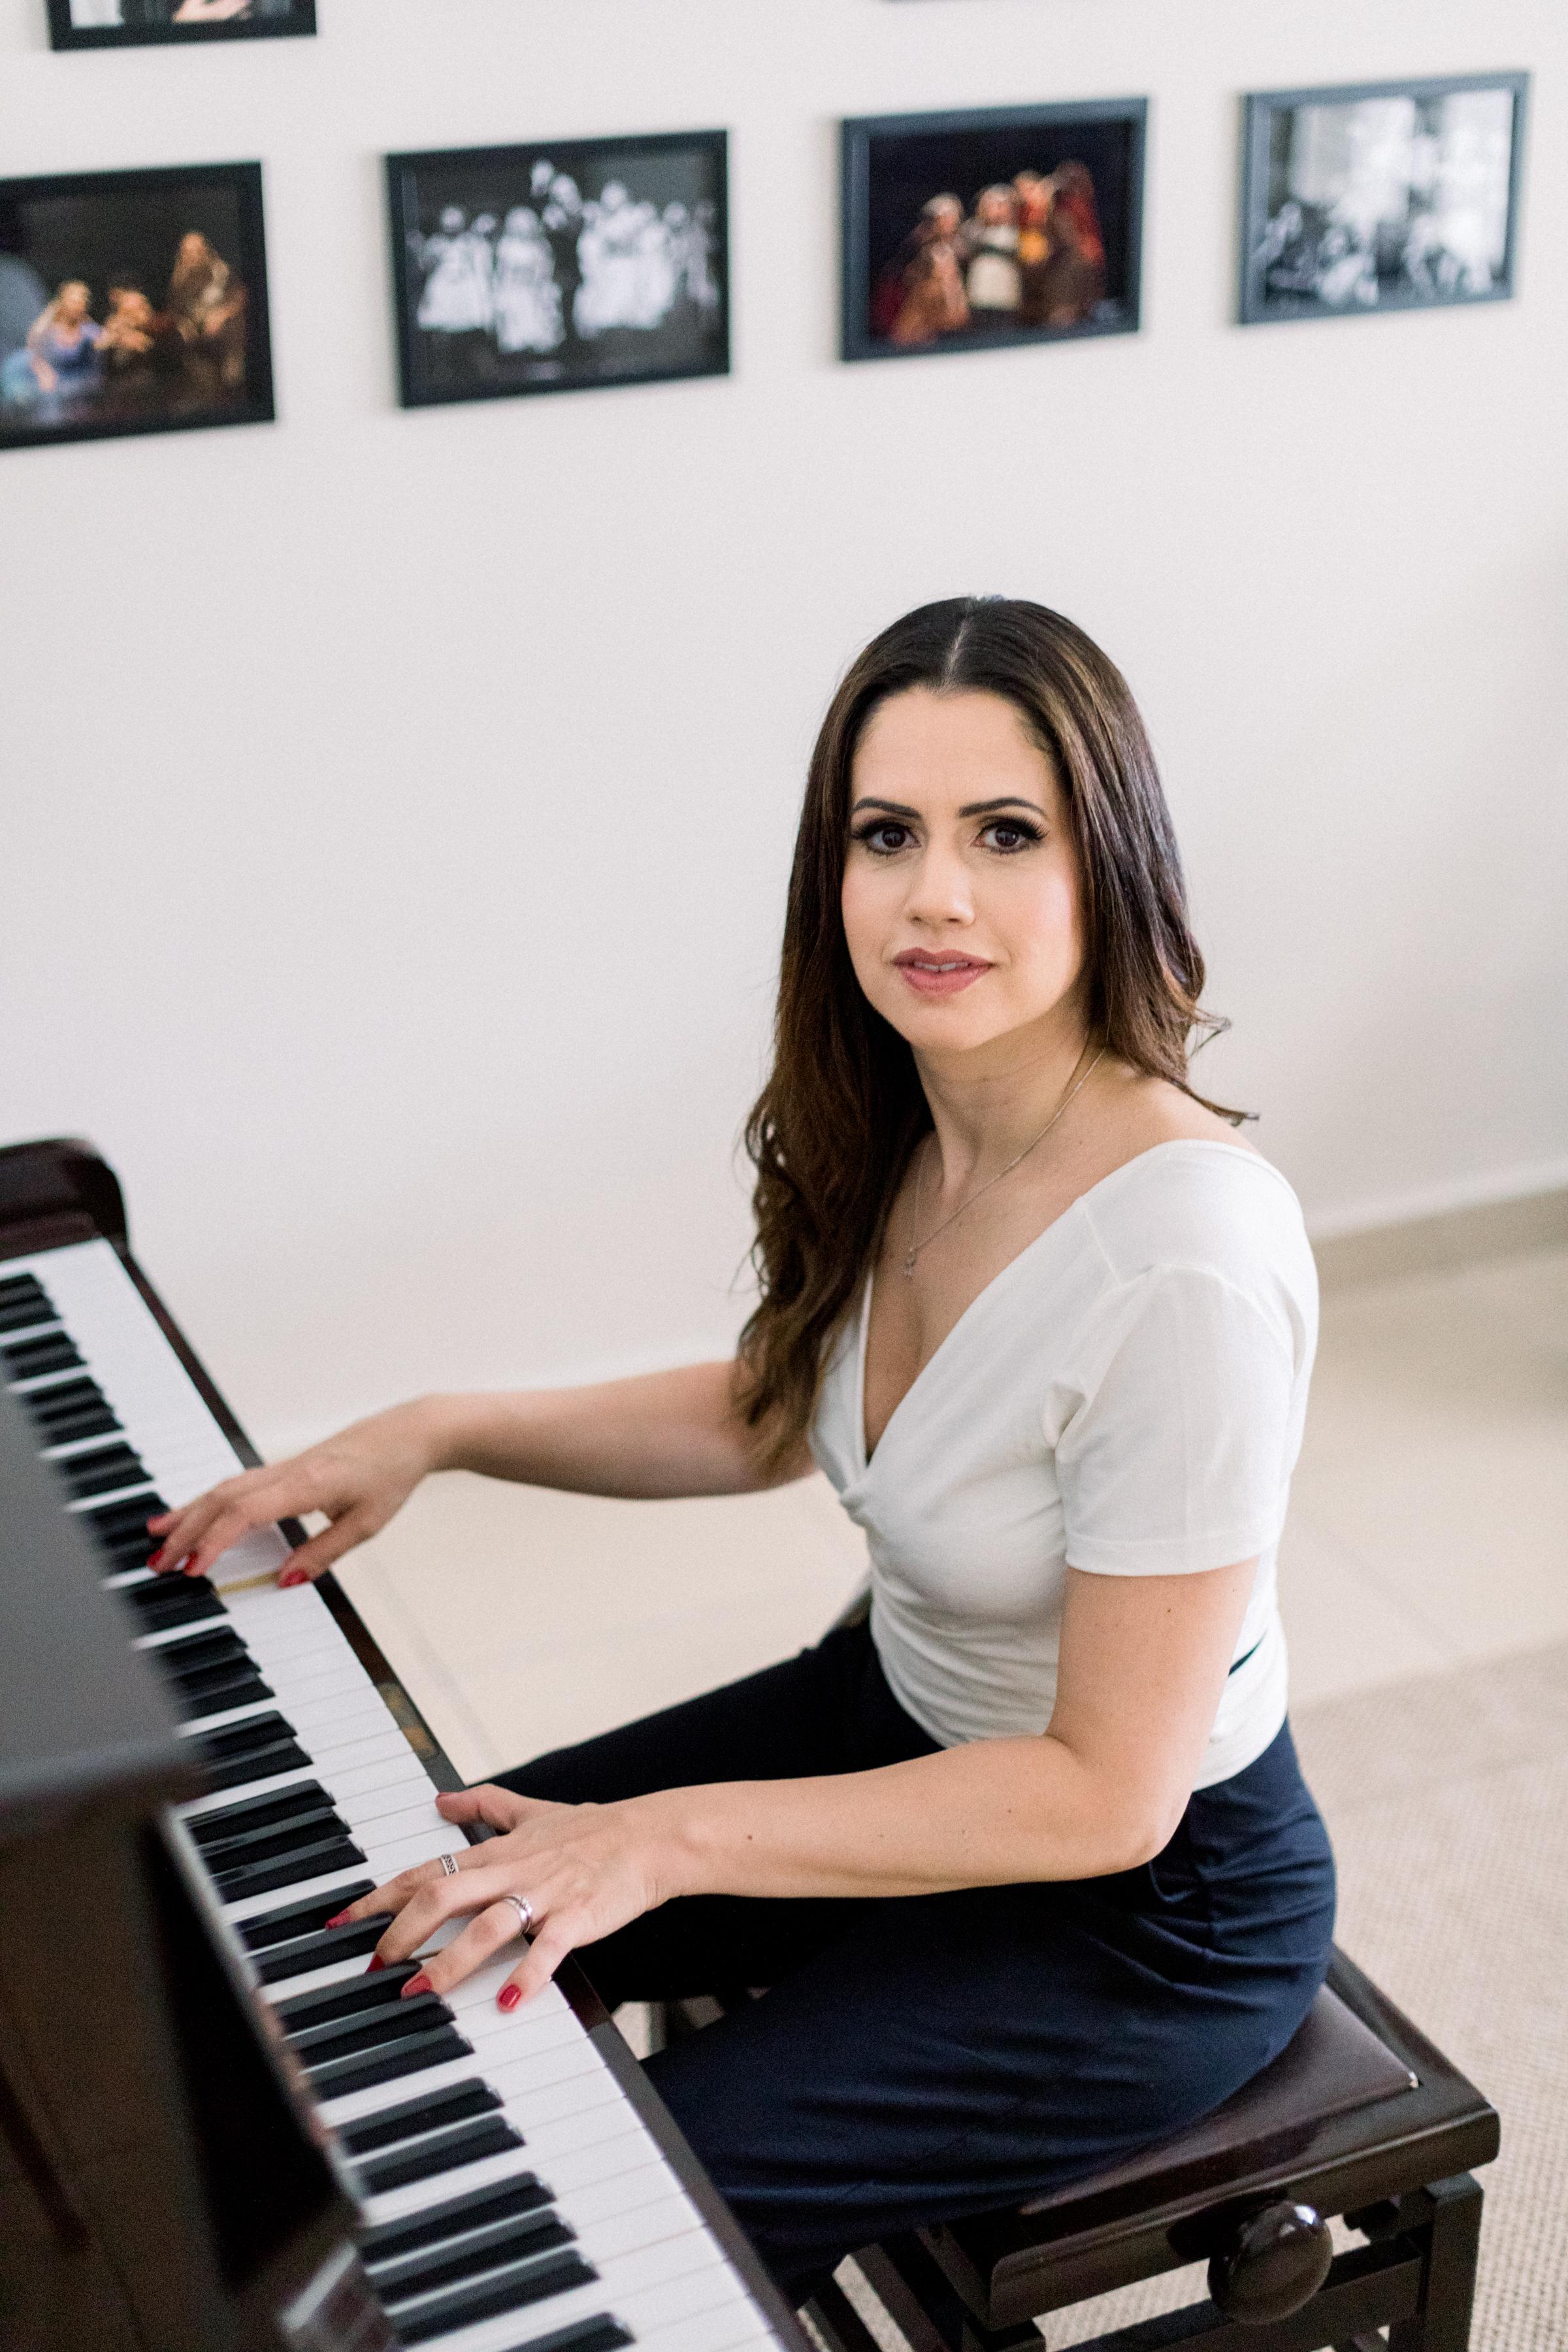 190228-0057-Tatiana-Gurgel-Branding-Studio-Musician-Elisenda-Llinares.jpg